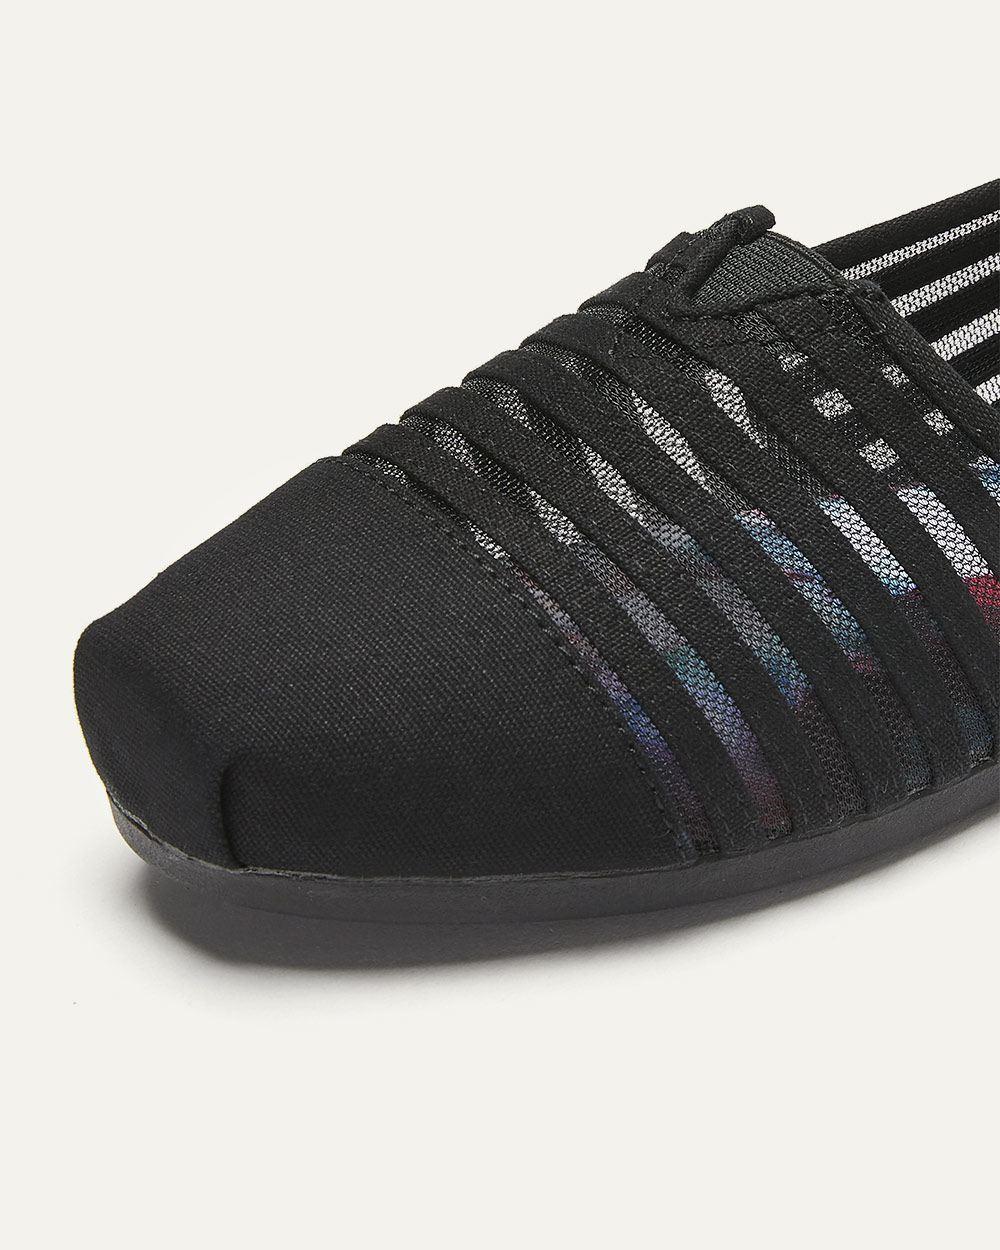 Skechers Bobs Plush, Adorbs - Wide